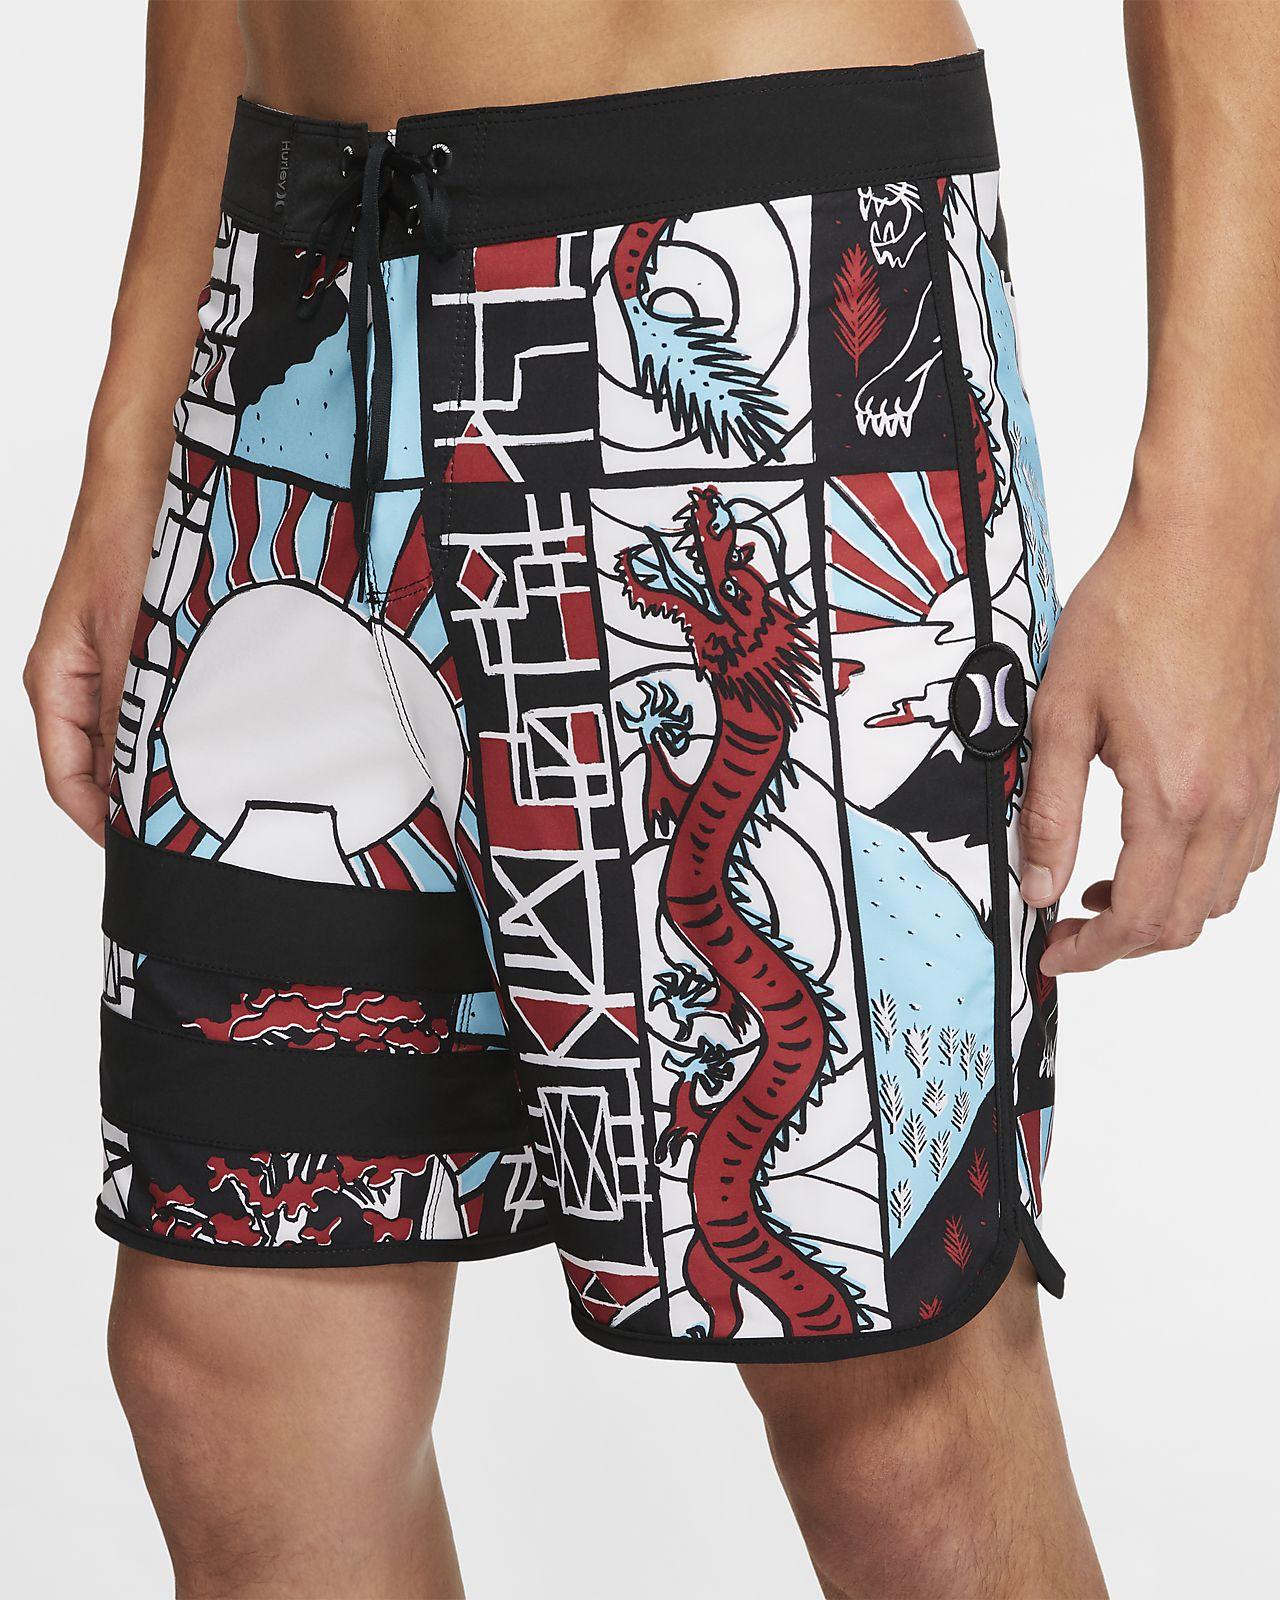 Hurley Phantom Block Party Yabai Herren-Boardshorts (ca. 46 cm)